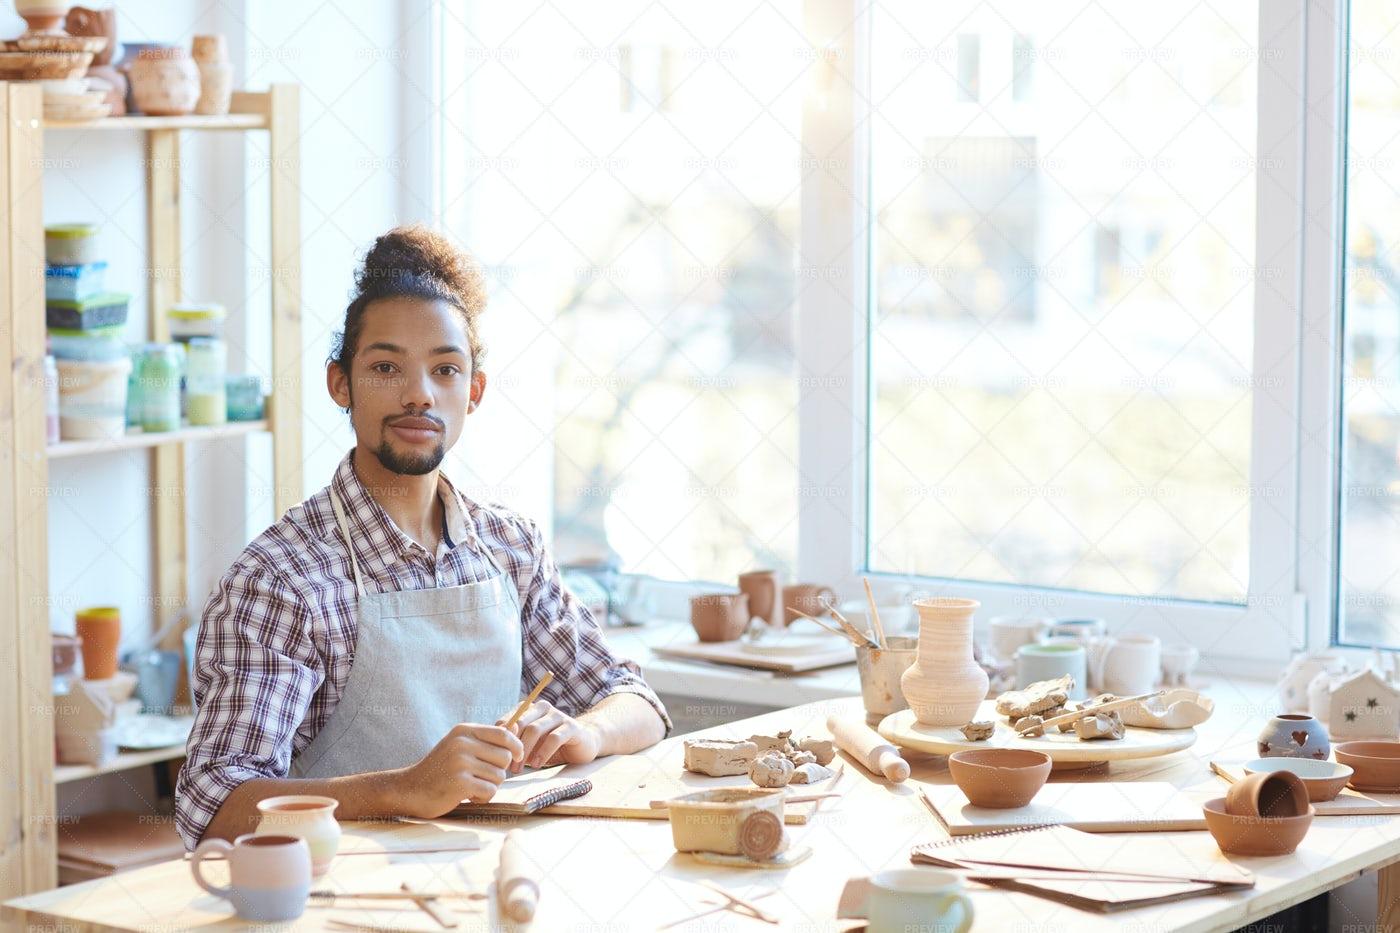 Confident Potter In Workshop: Stock Photos